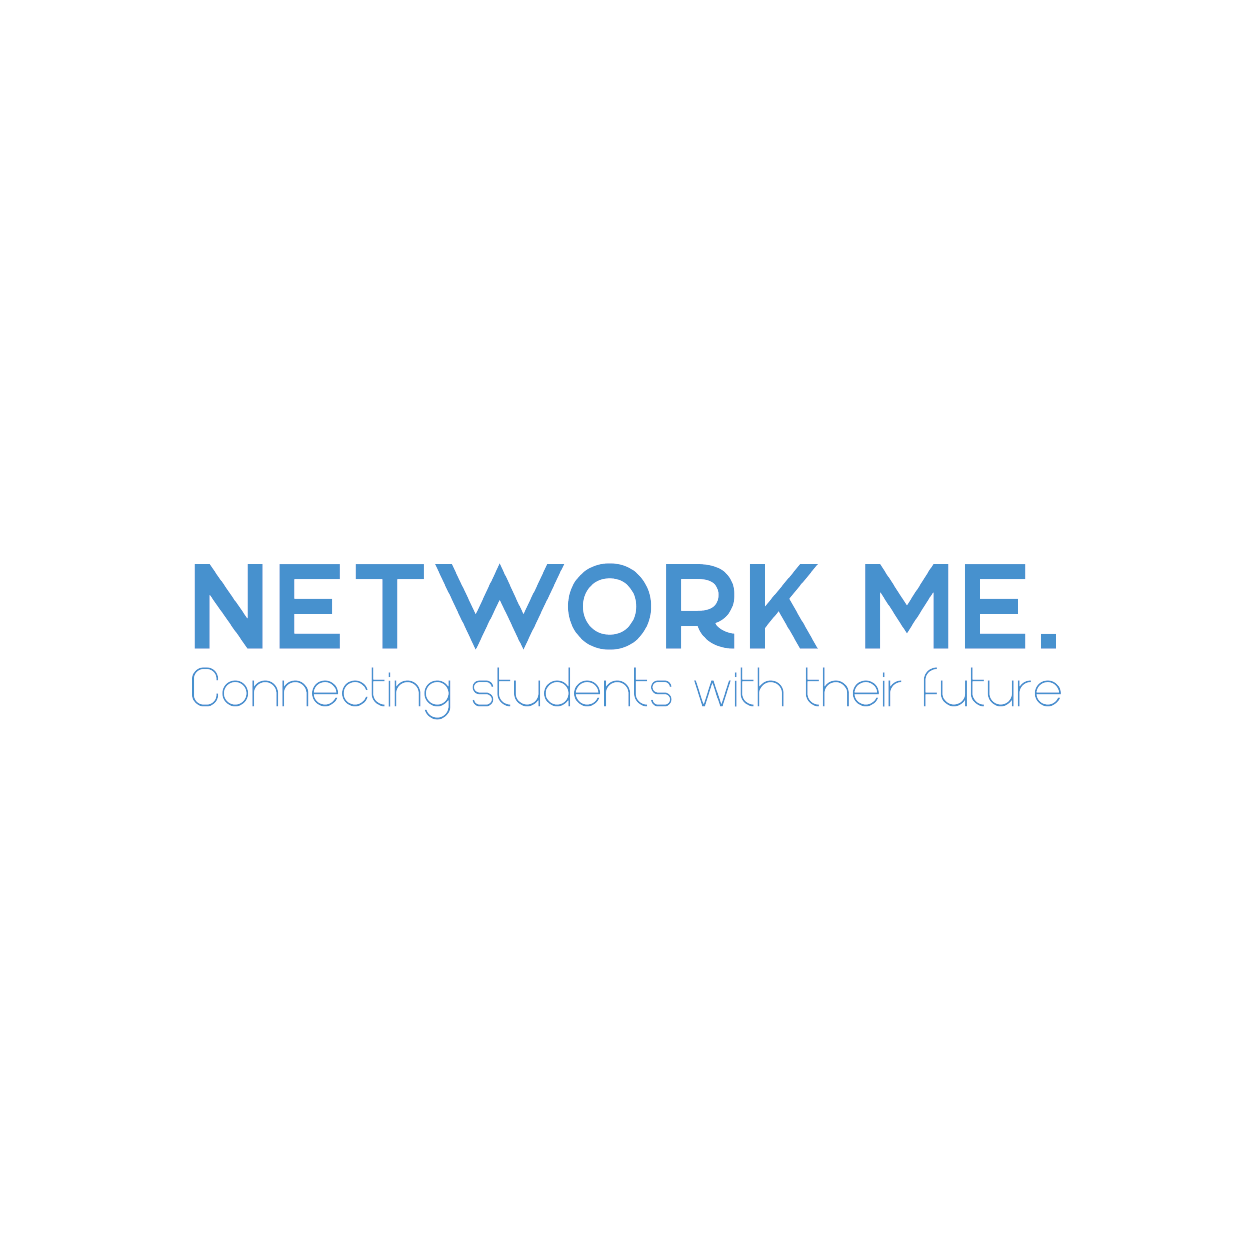 networkme